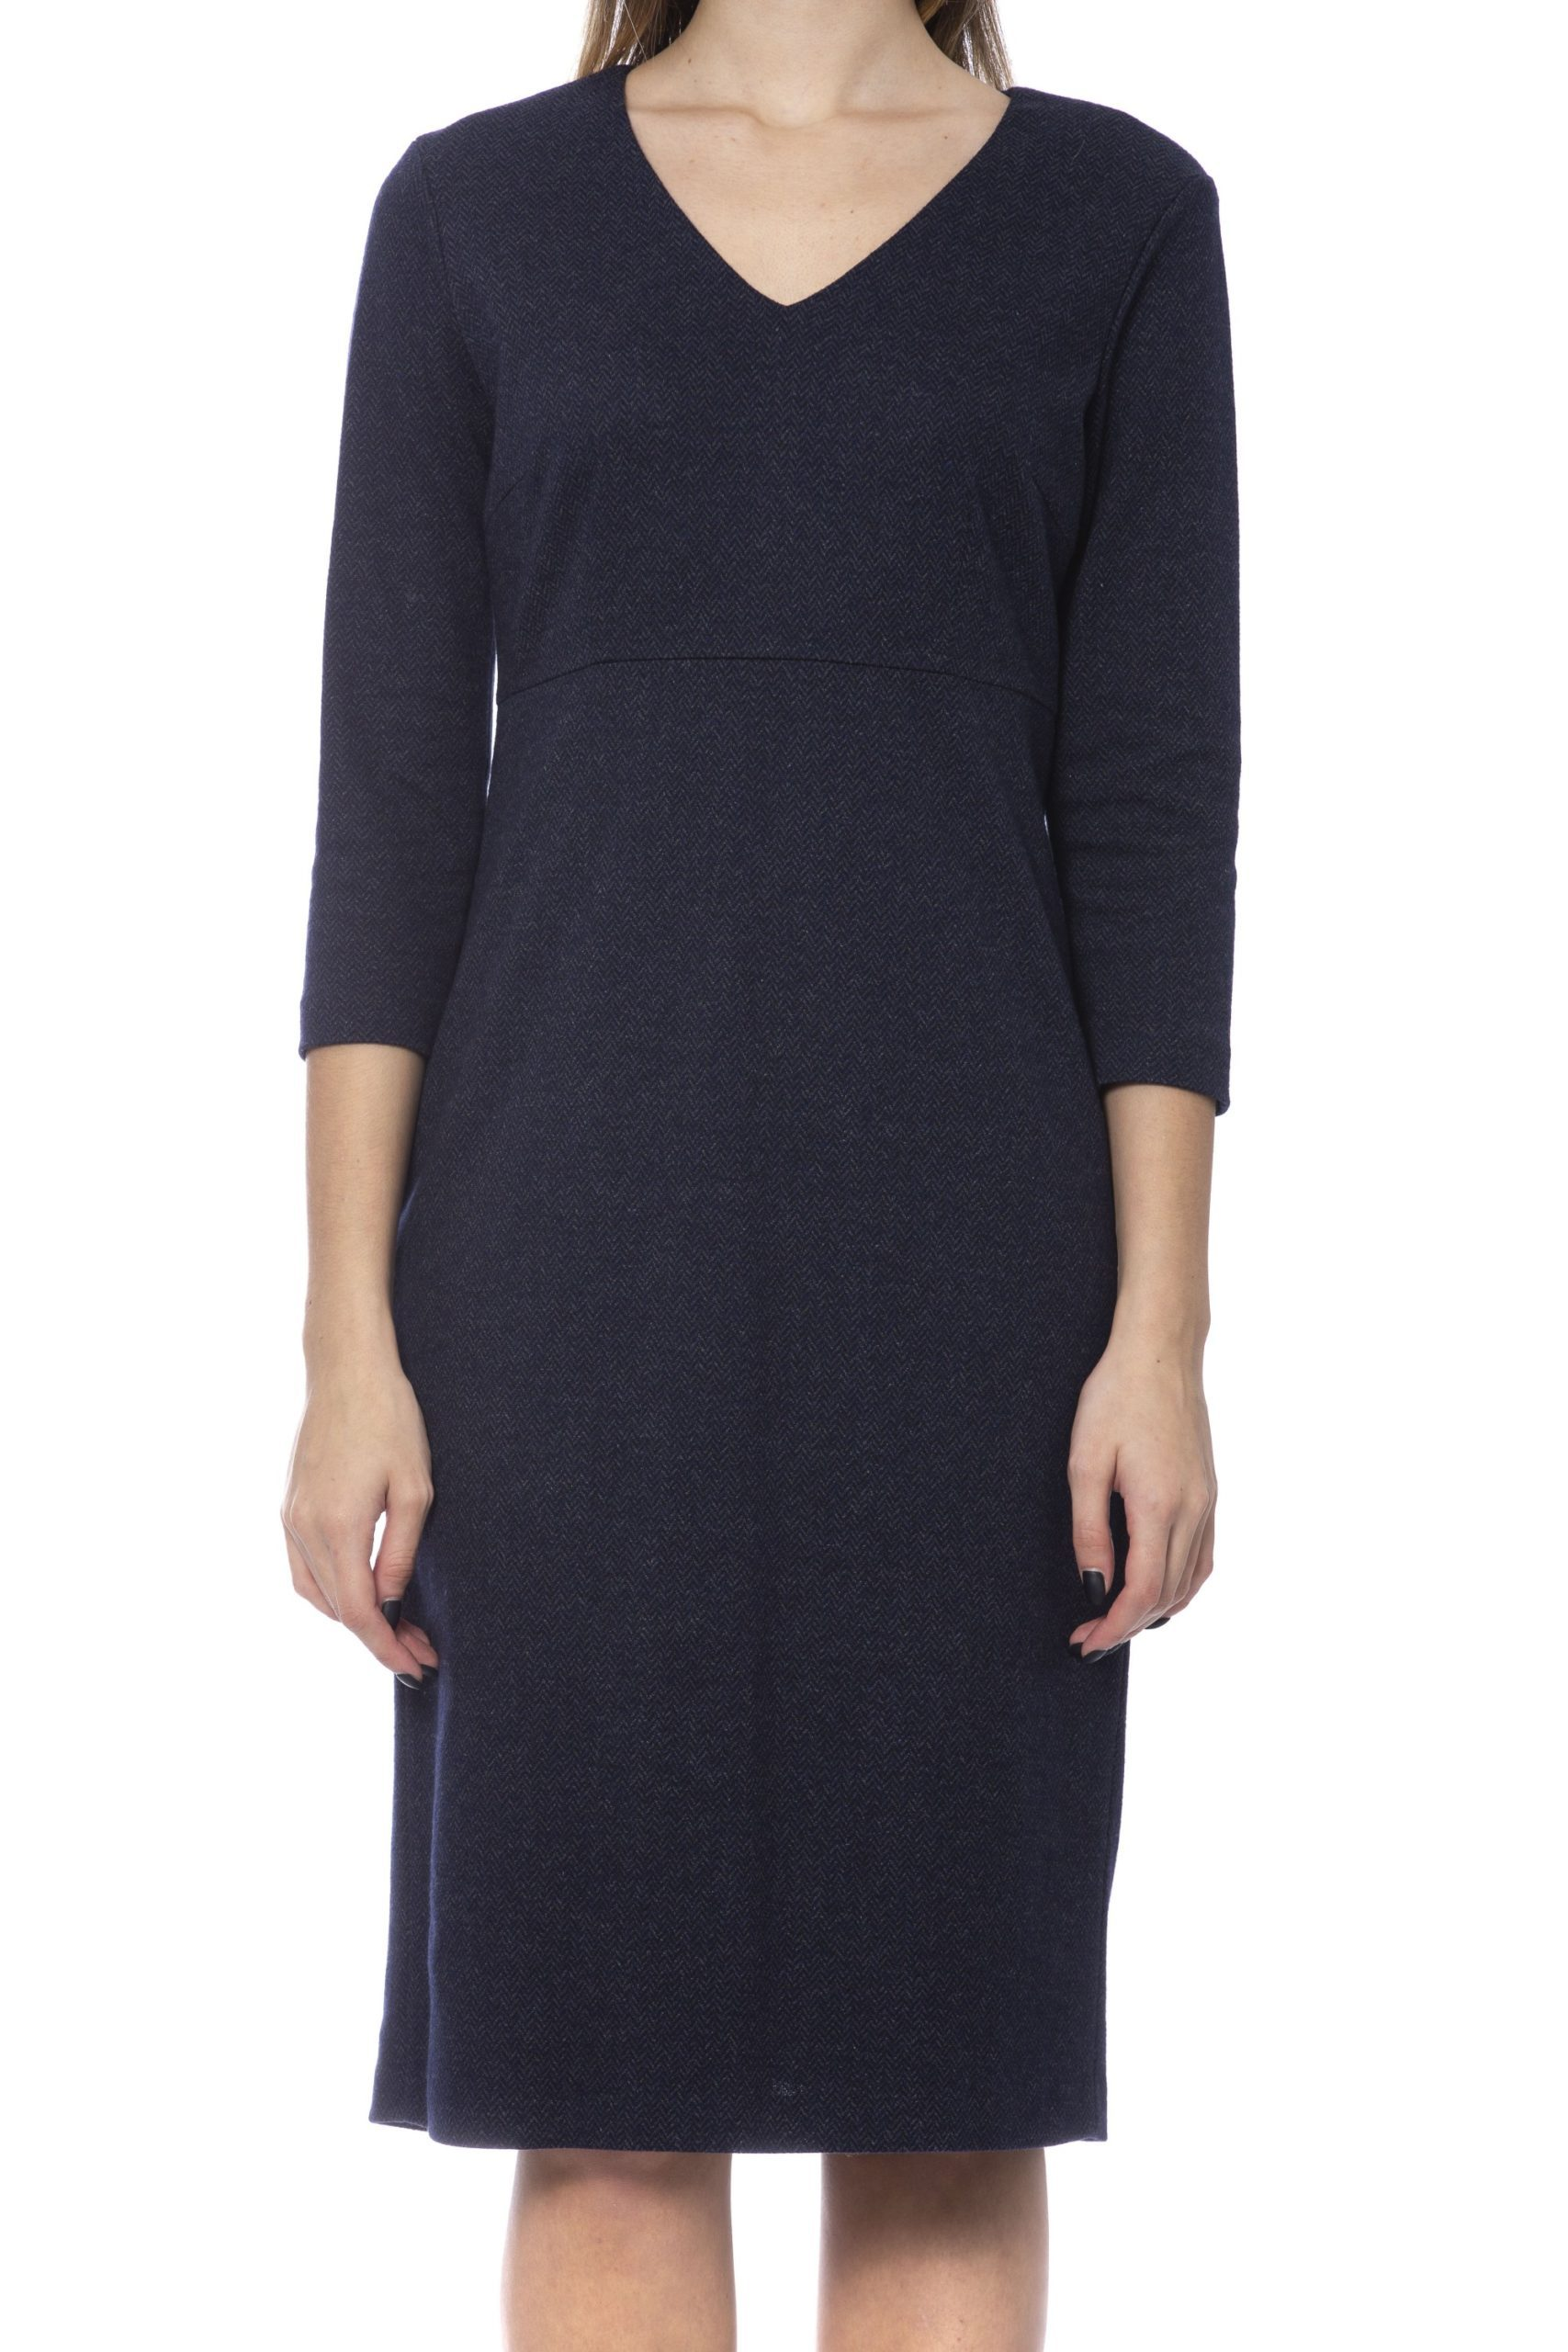 Peserico Women's Dress Blue PE993370 - IT42 | S